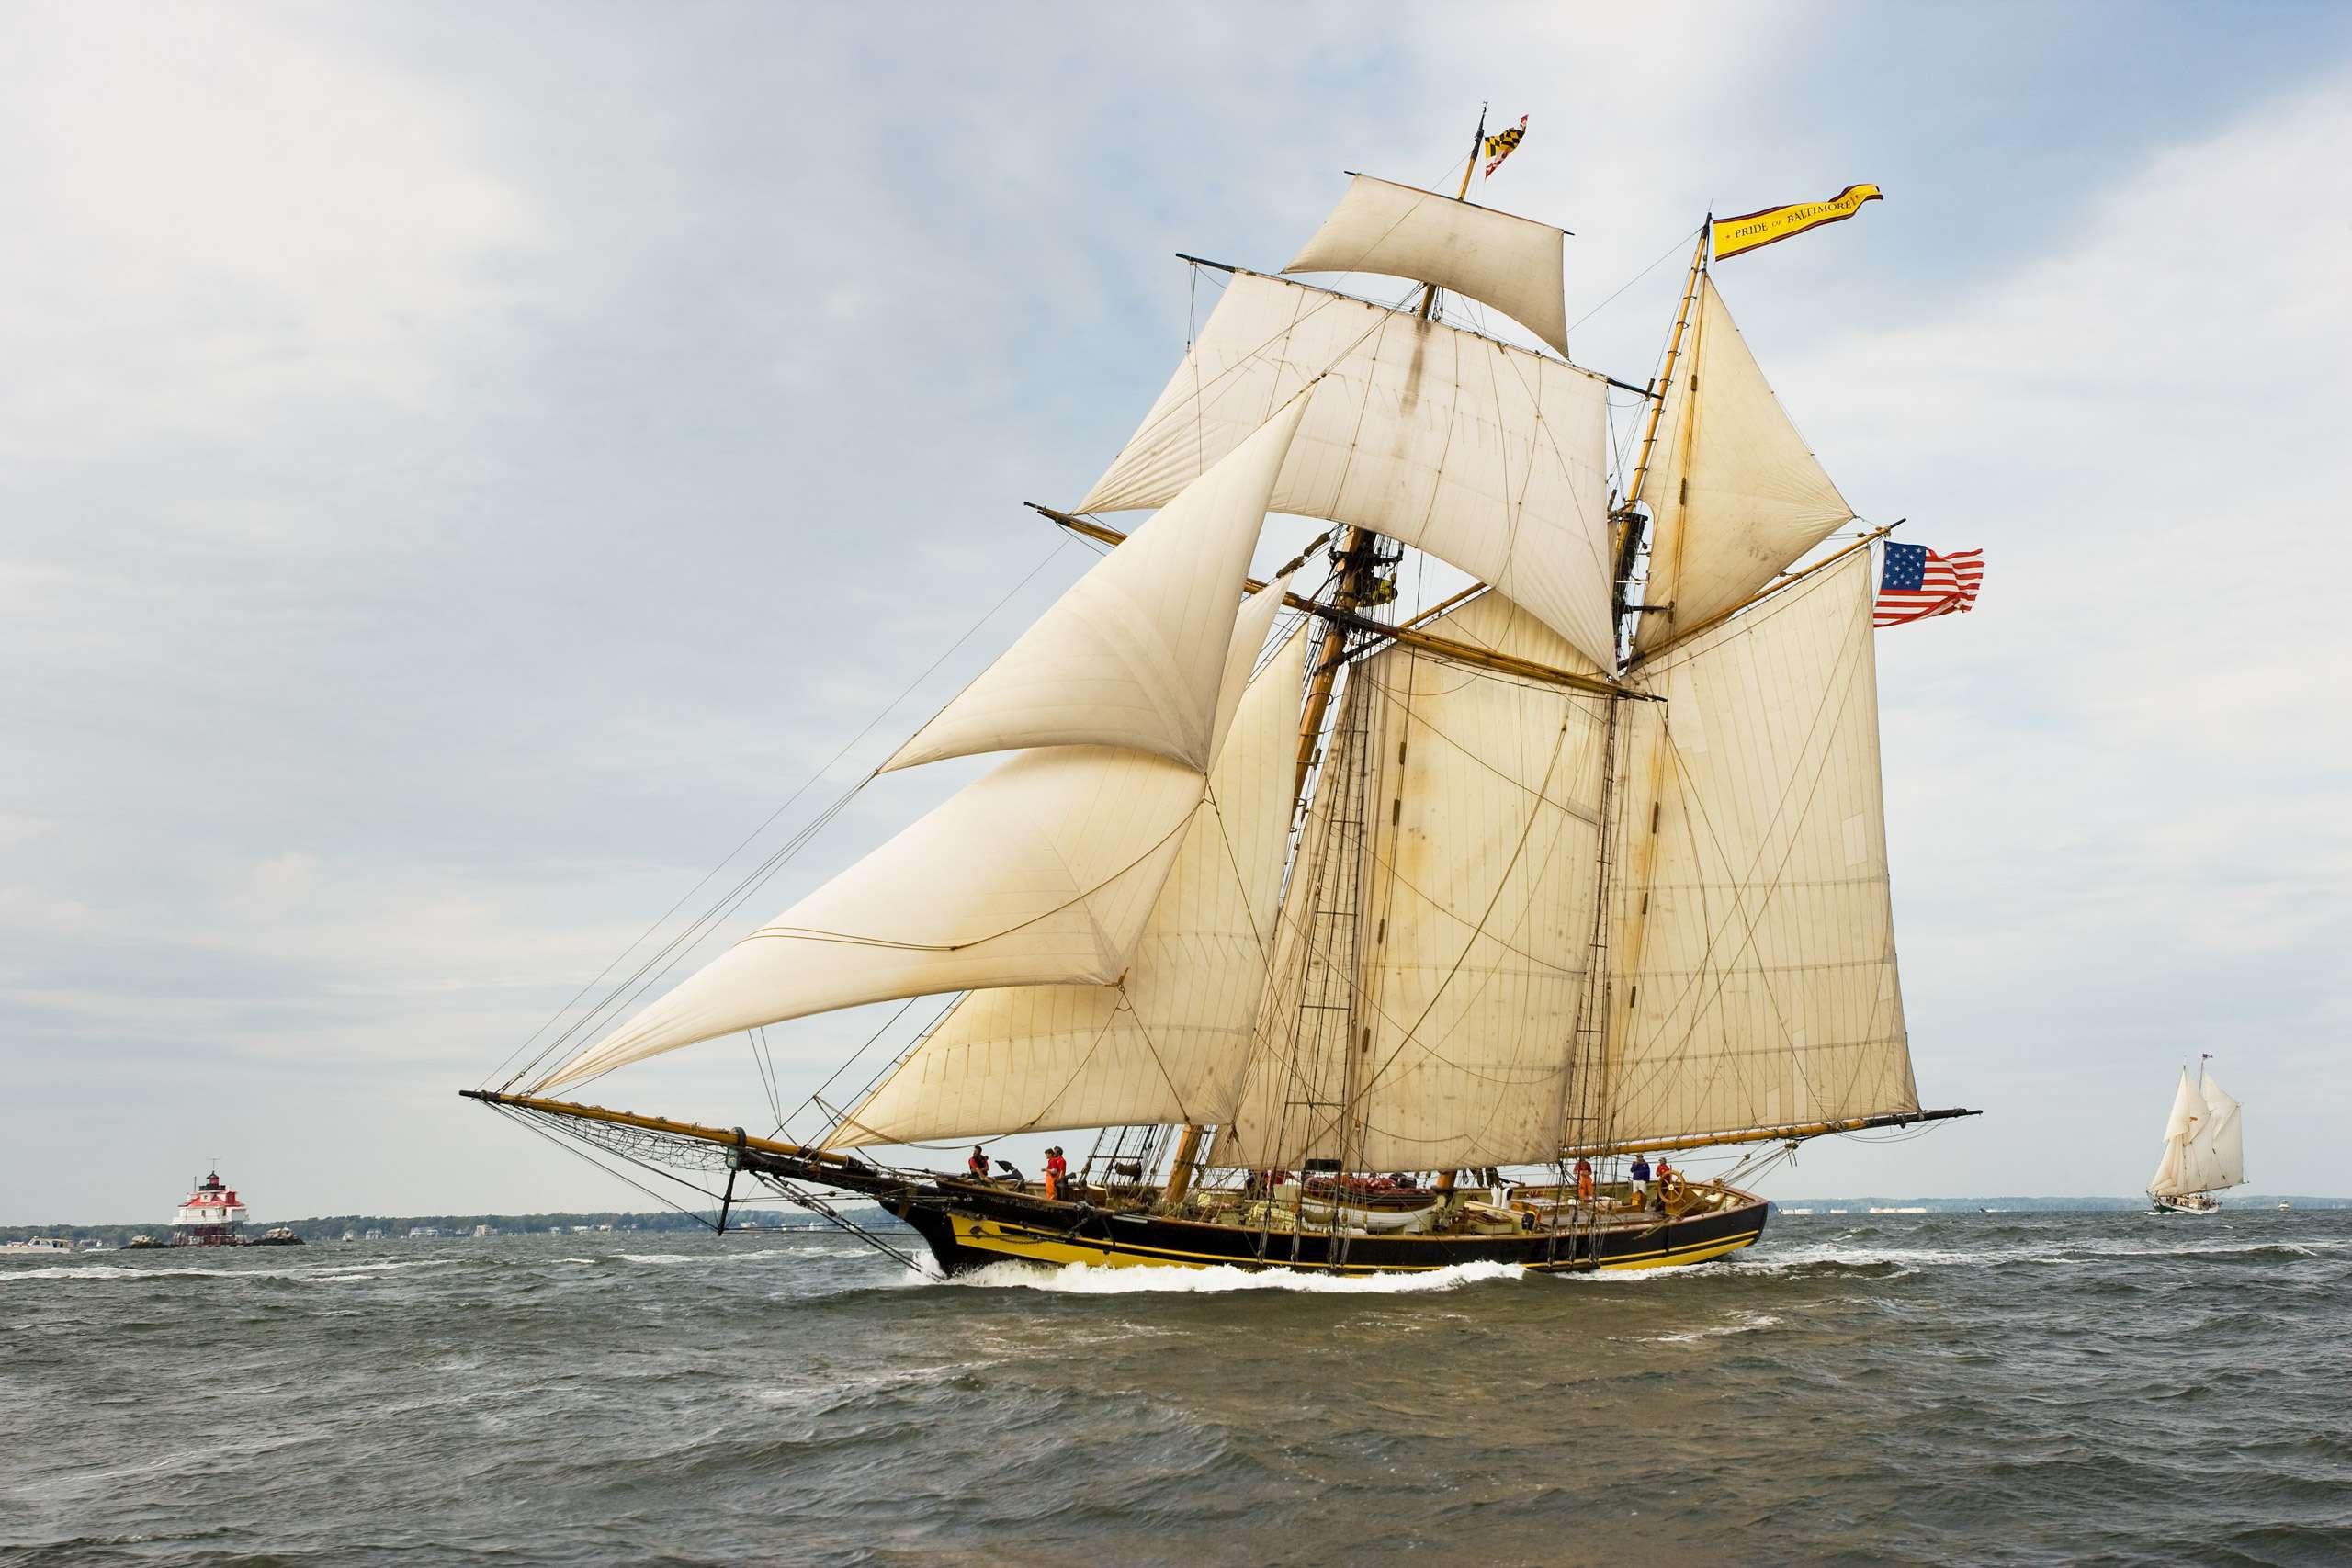 PORTFOLIO - Sailing - Tall Ships #12-PCG285